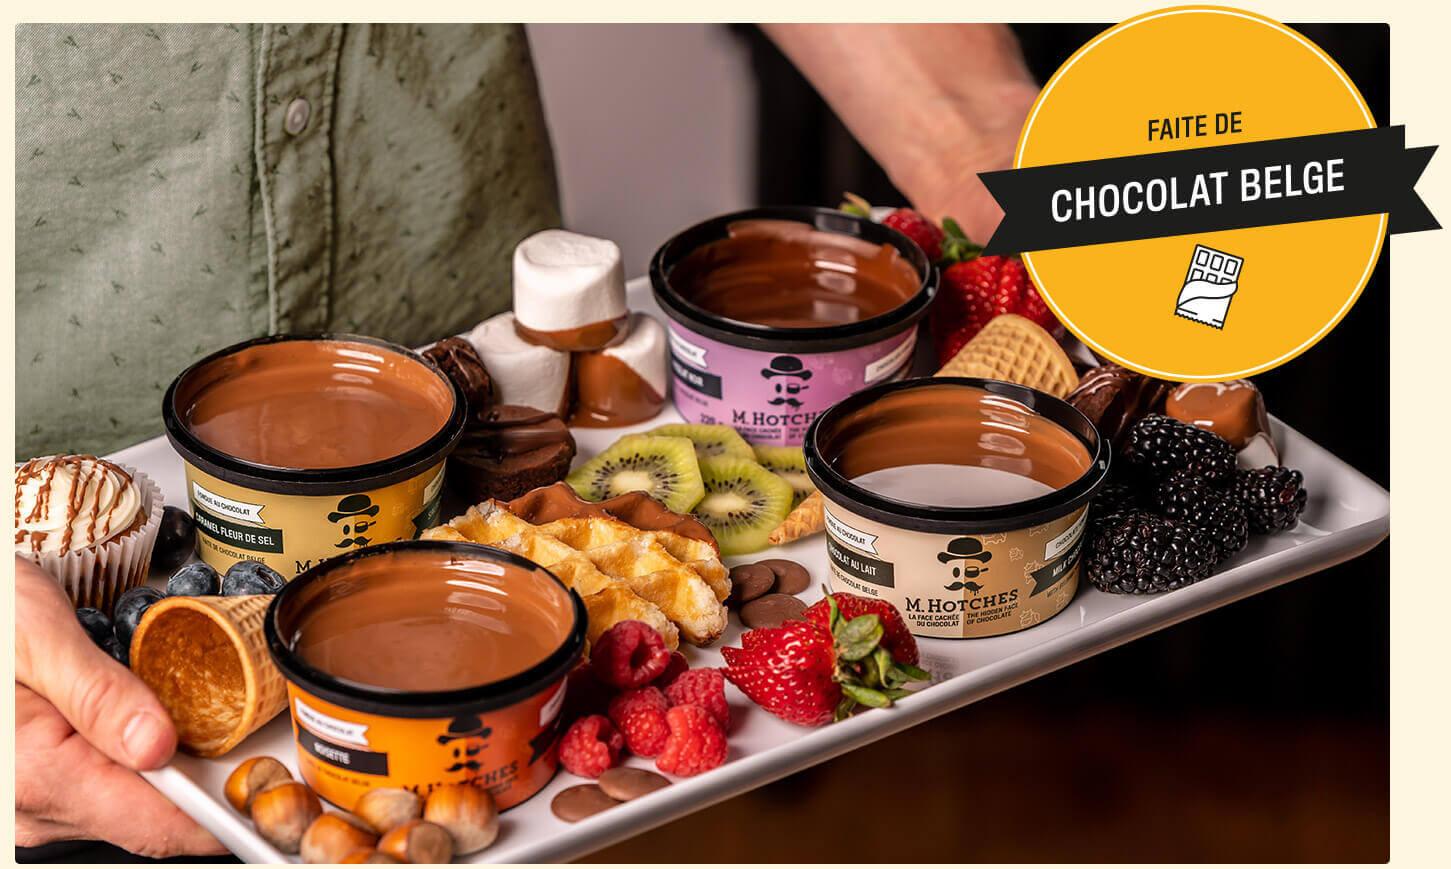 m-hotches-fait-chocolat-belge-accueil-1-minute